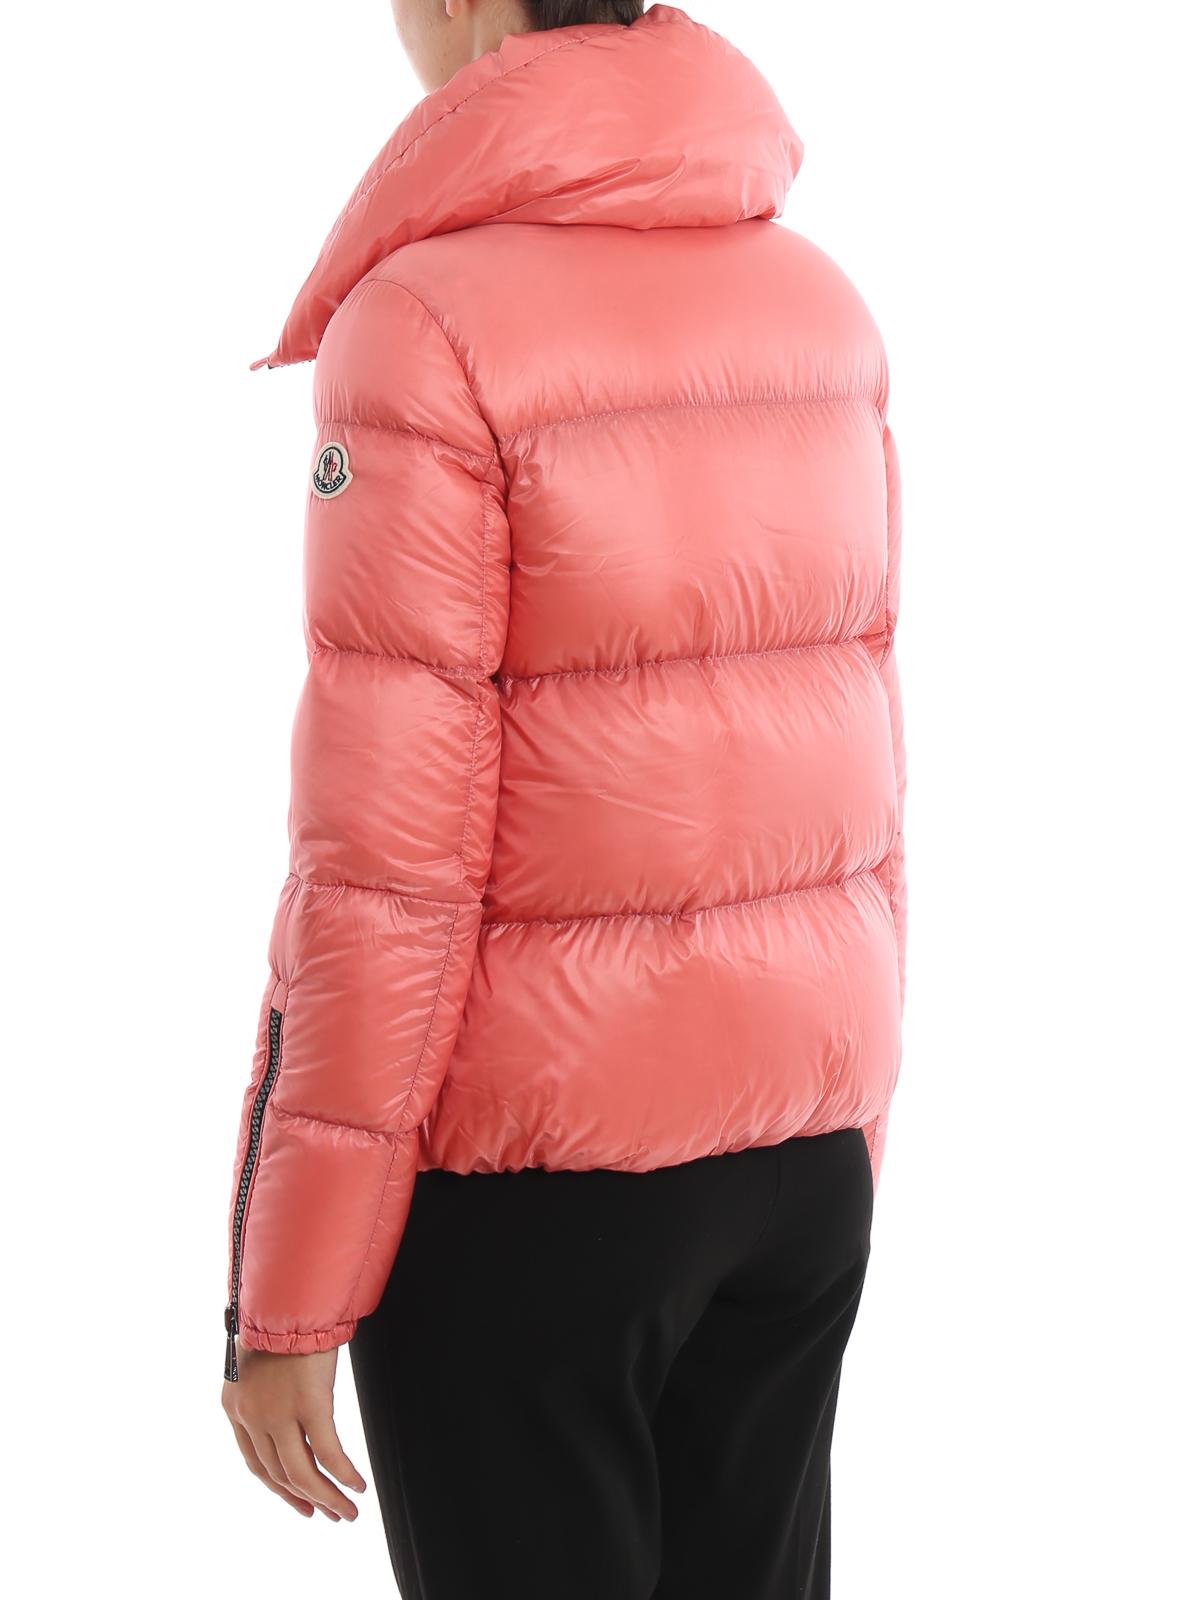 8c7756e17 Moncler - Bandama blush pink puffer jacket - padded jackets ...